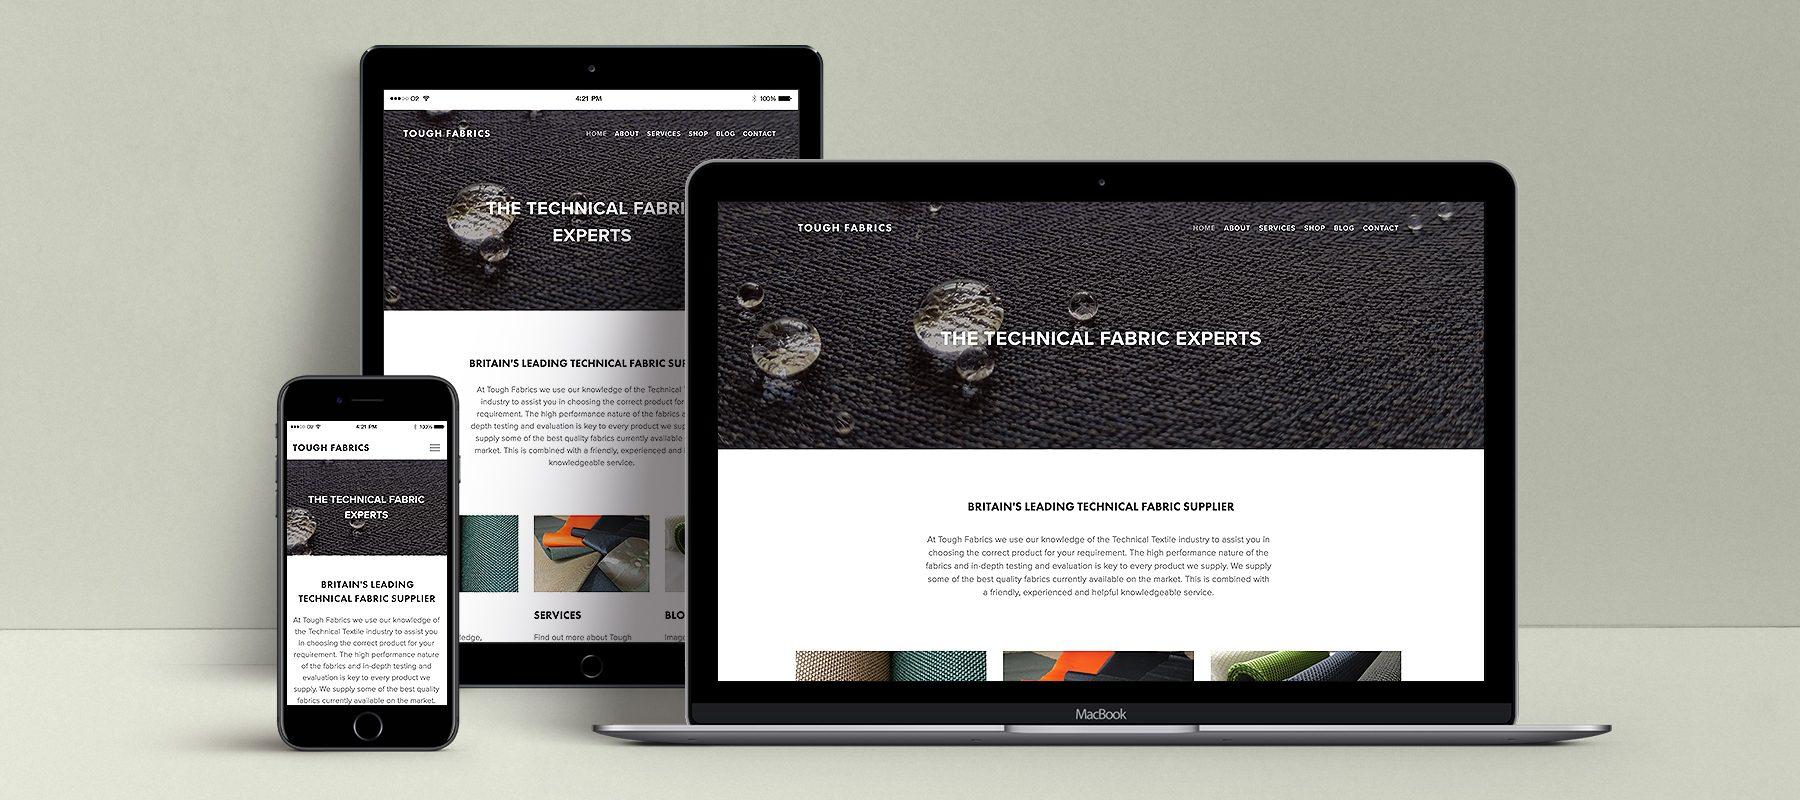 technical fabric supplier tough fabrics web design responsive website mockup